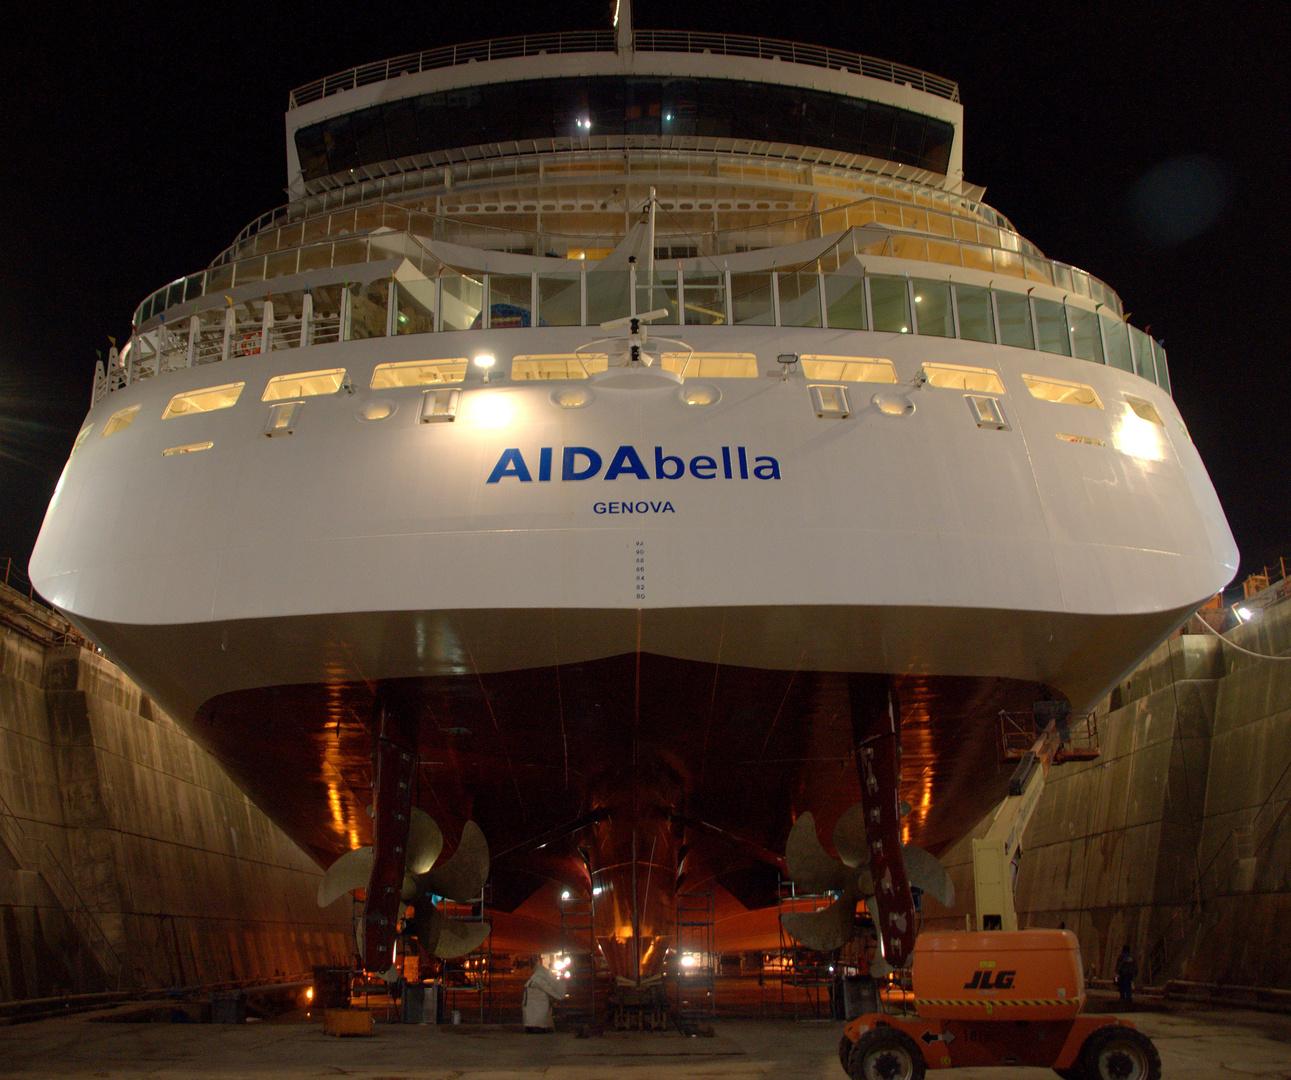 AIDAbella